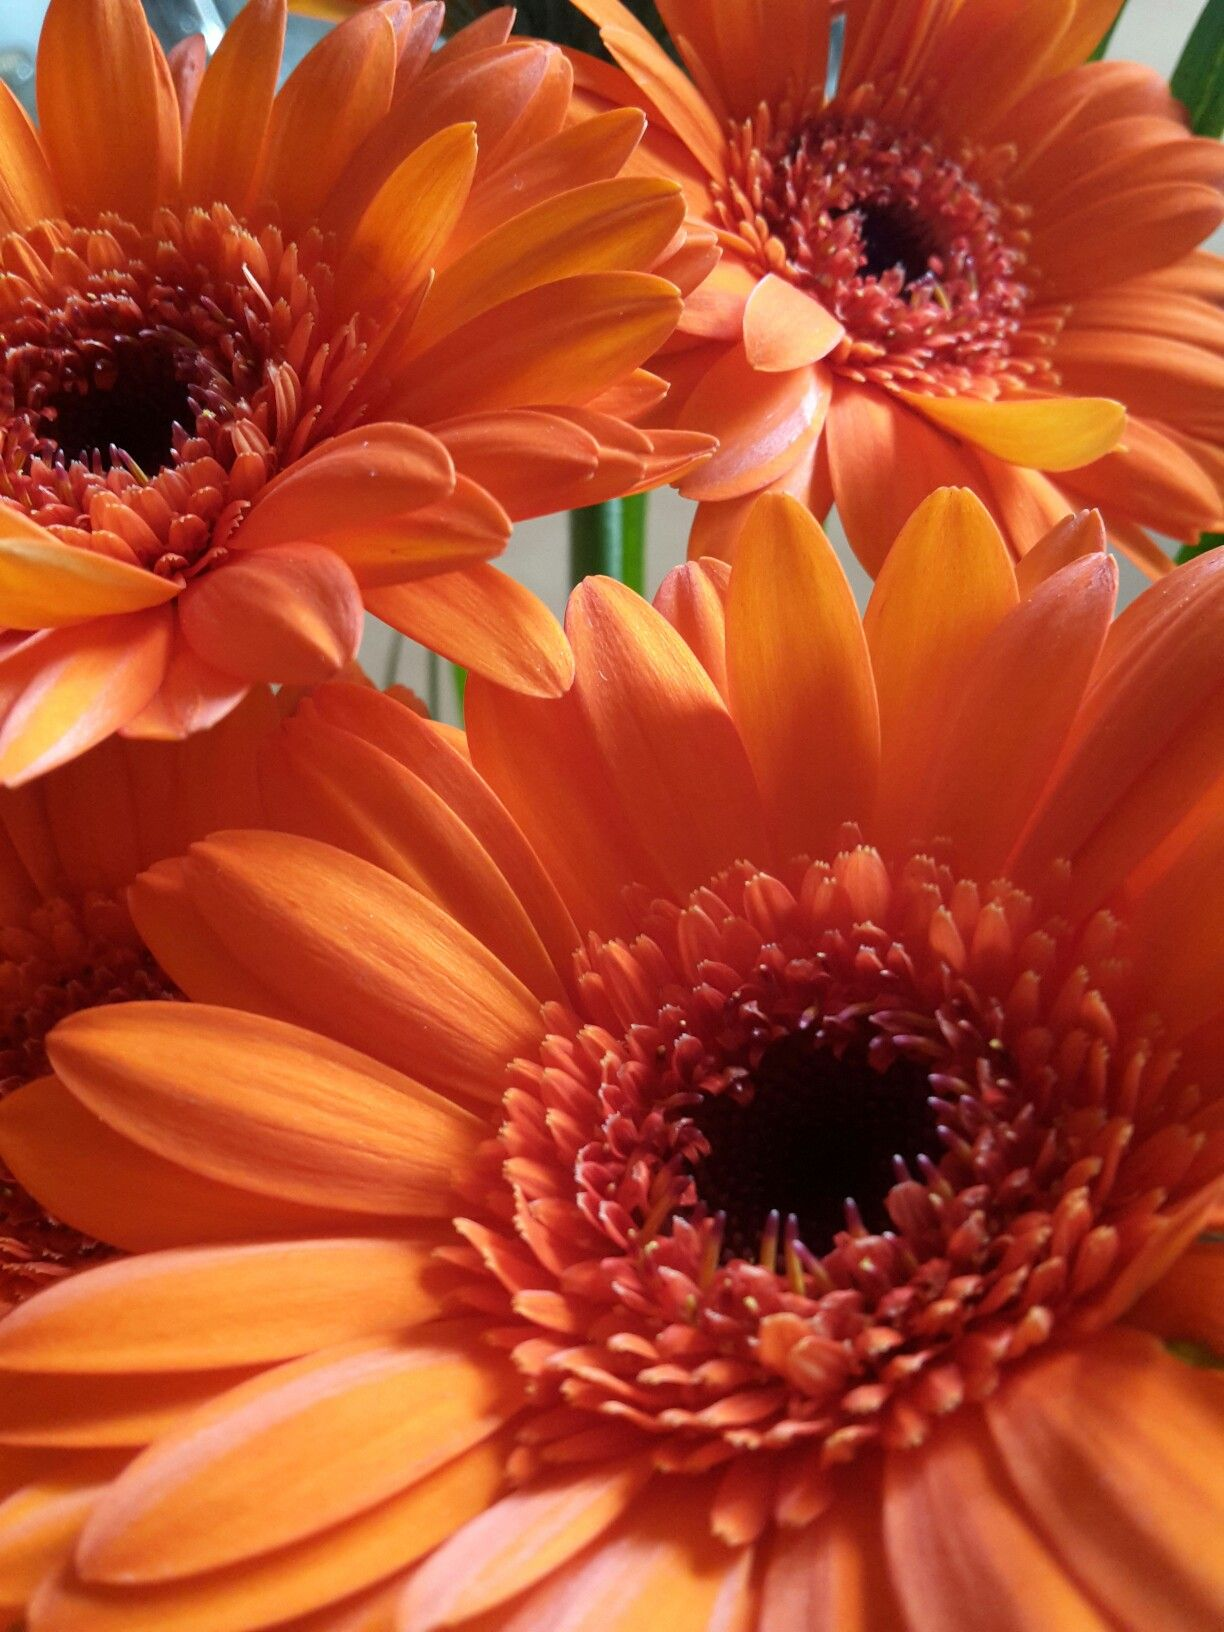 Gerbera Different Kinds Of Flowers Wonderful Flowers Flower Aesthetic